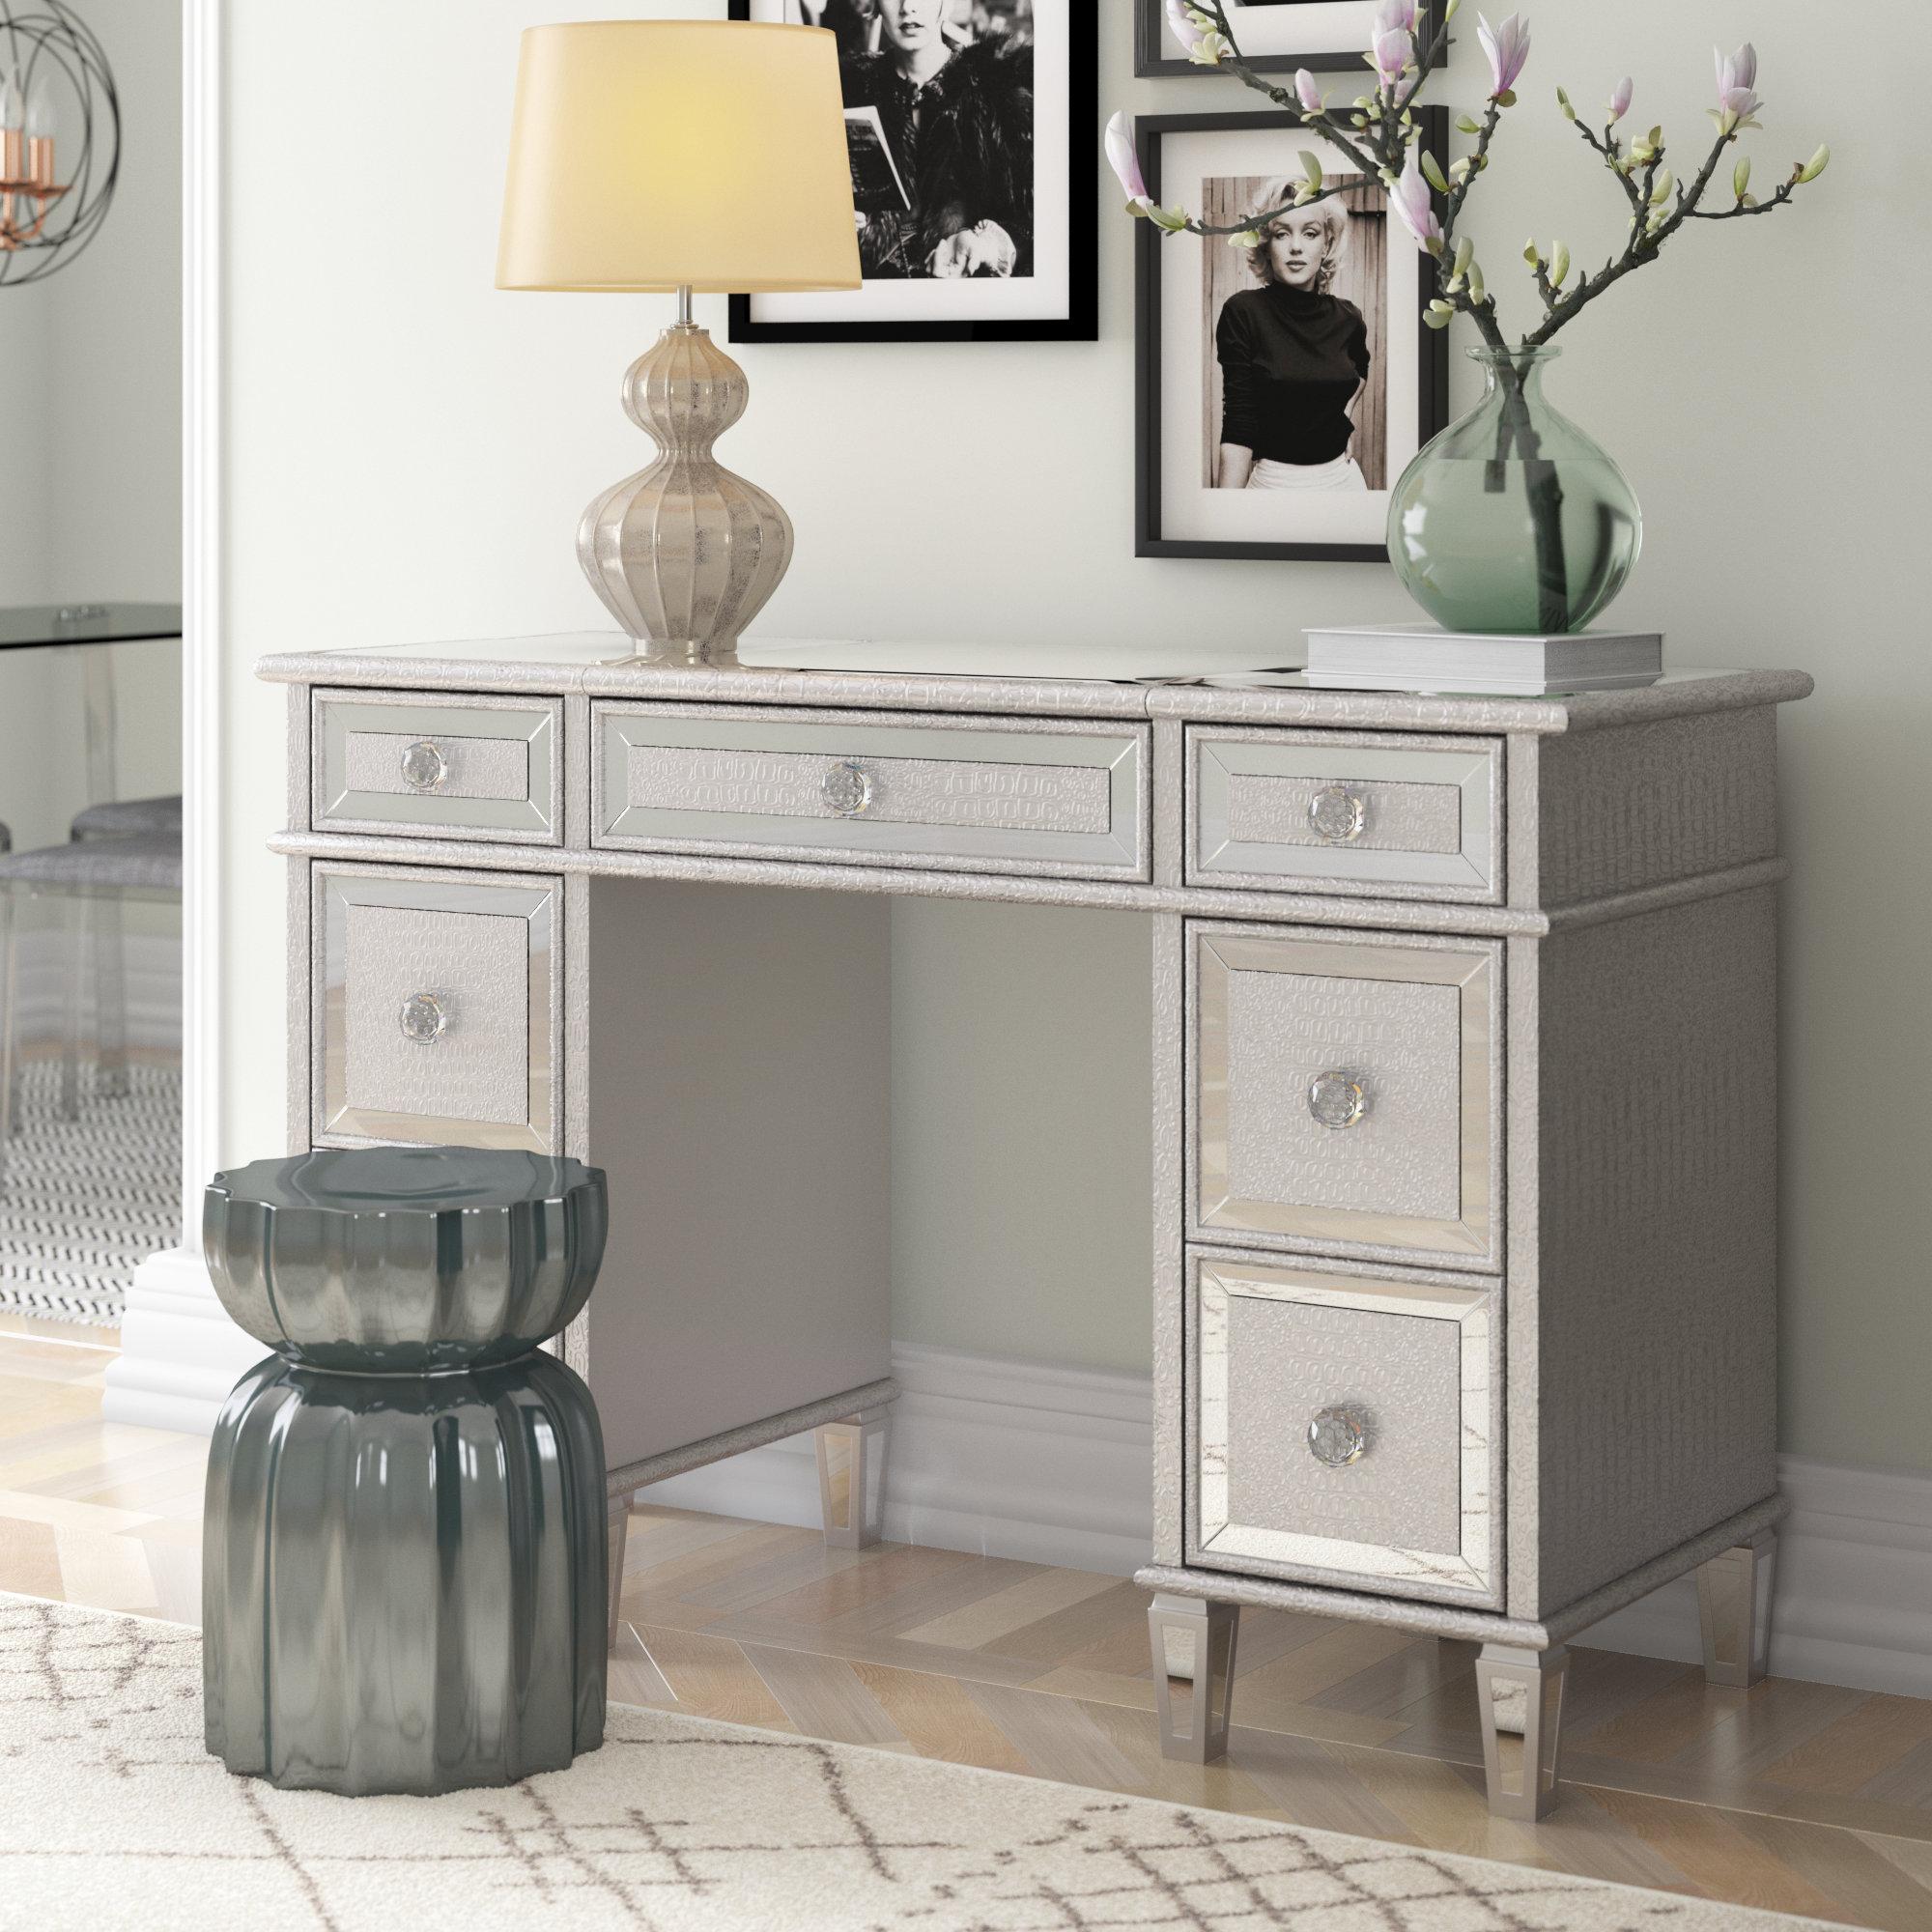 Willa Arlo Interiors Dressing Table